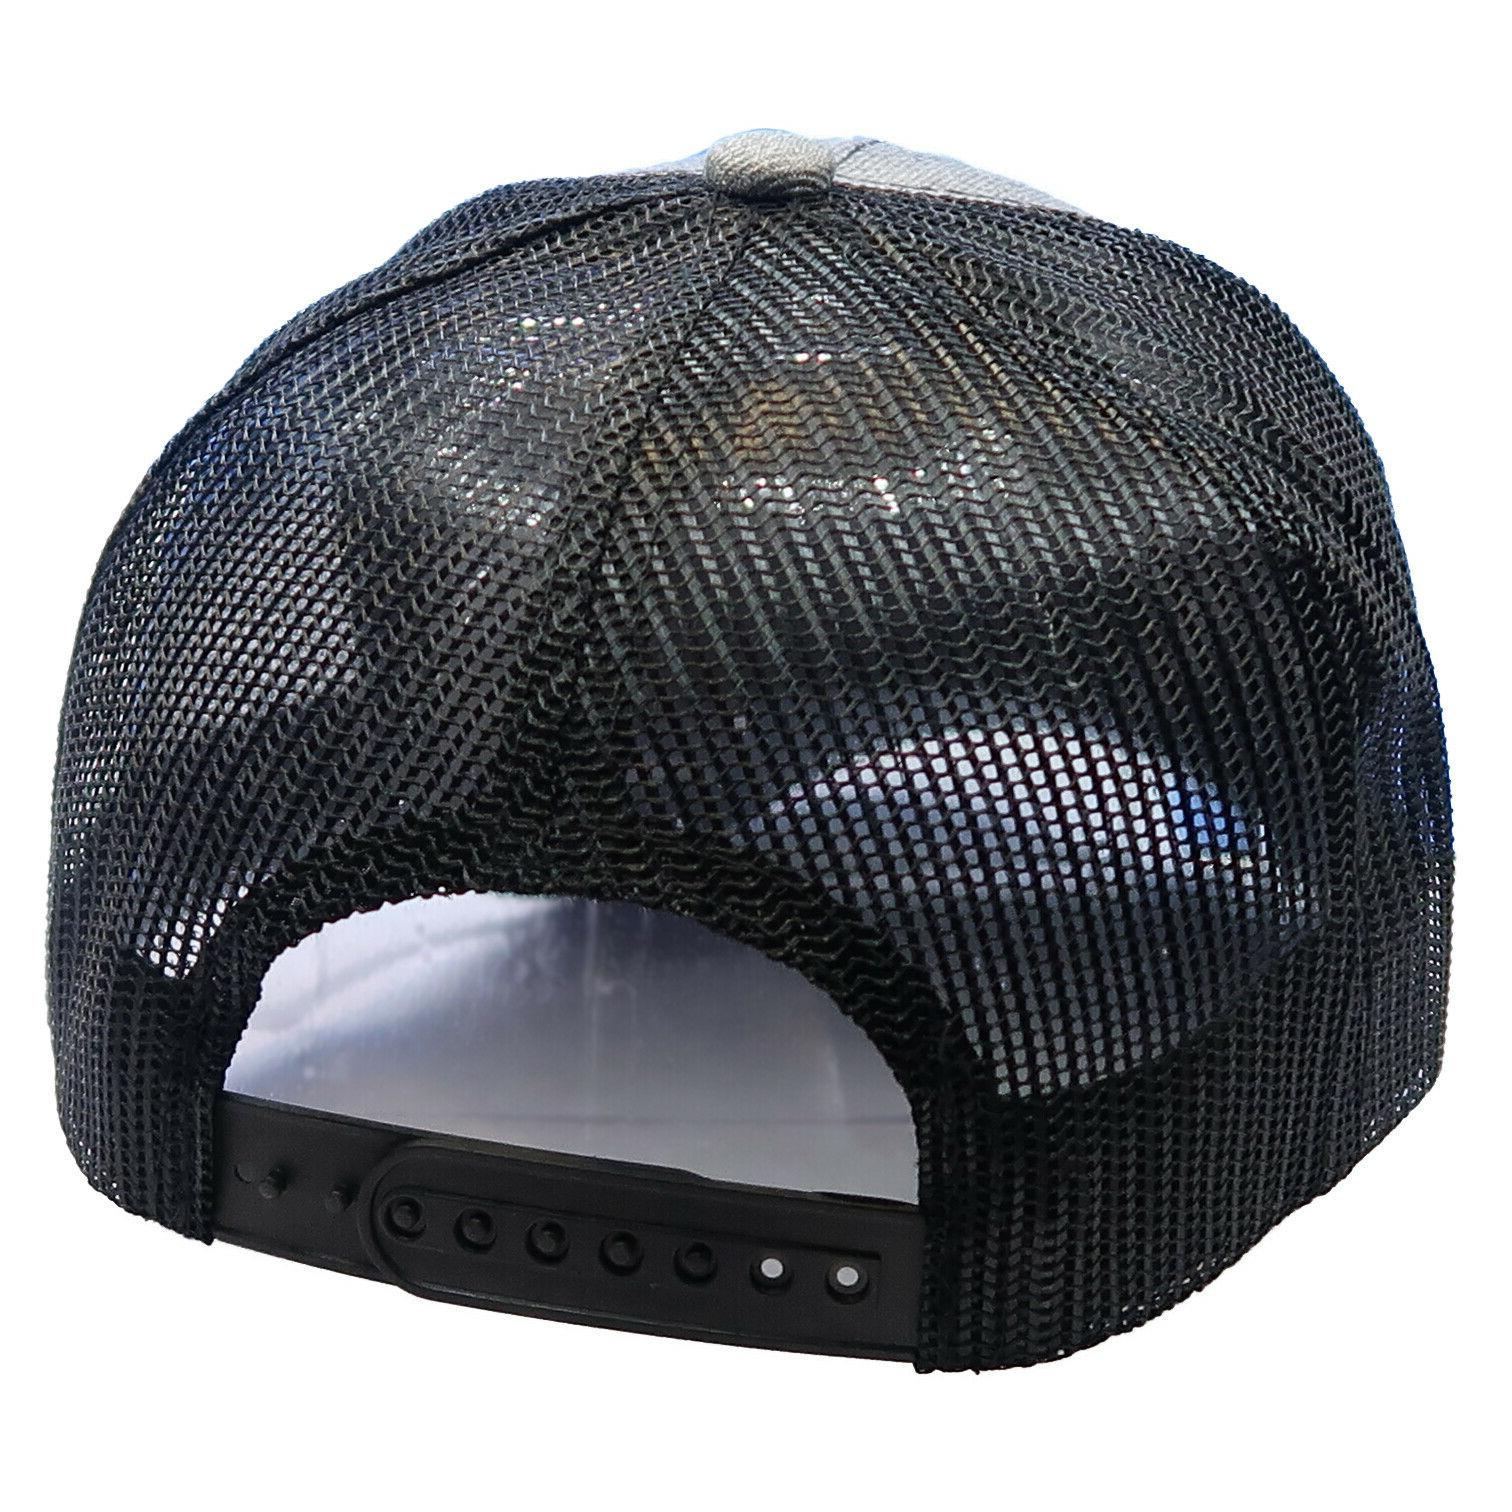 Trucker Hat Cotton Solid Baseball Cap Mens